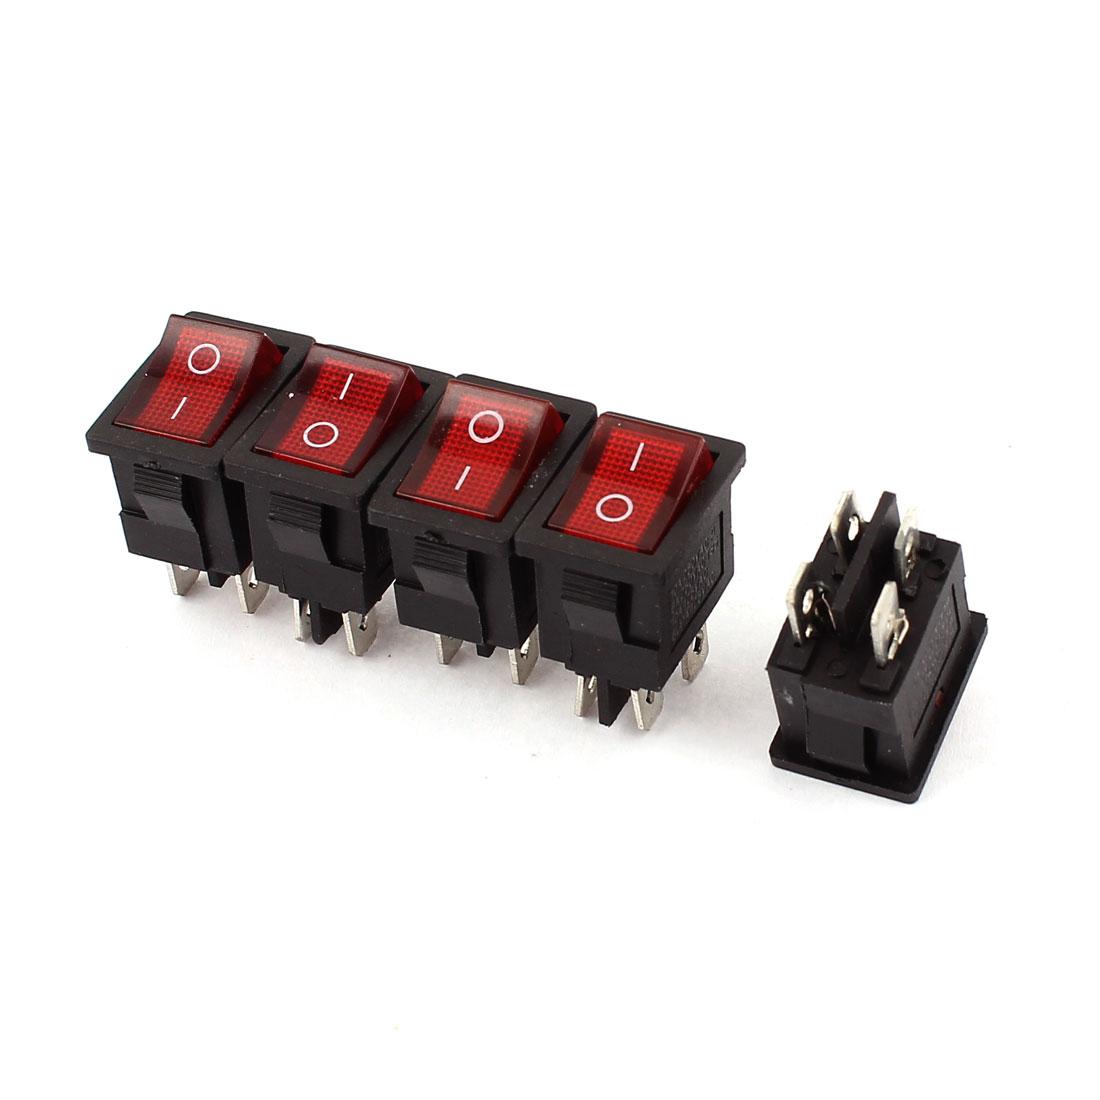 5PCS Red Lamp 4 Pins DPST On/Off Boat Rocker Switch AC 250V 10/6A 125V 10/6A